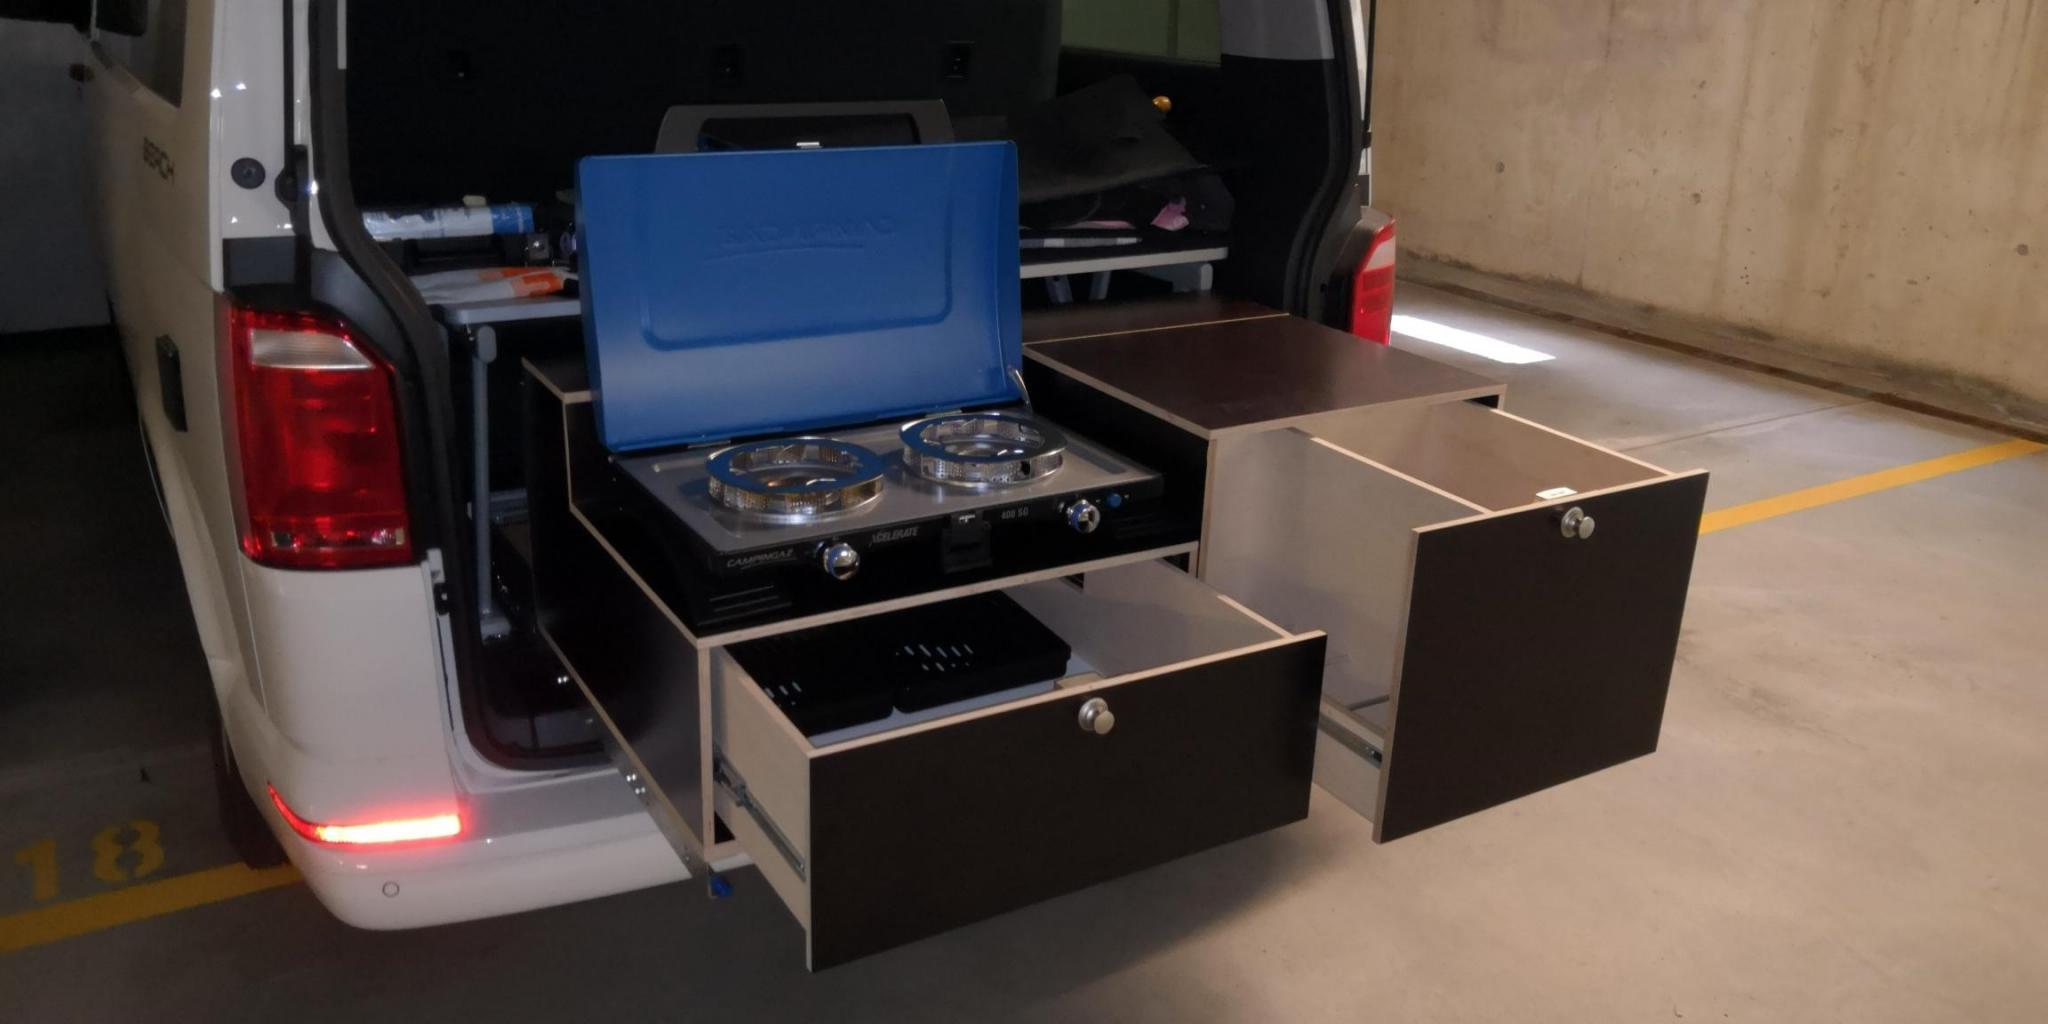 Kofferraum kuche selber bauen for Kuchenblock selber bauen